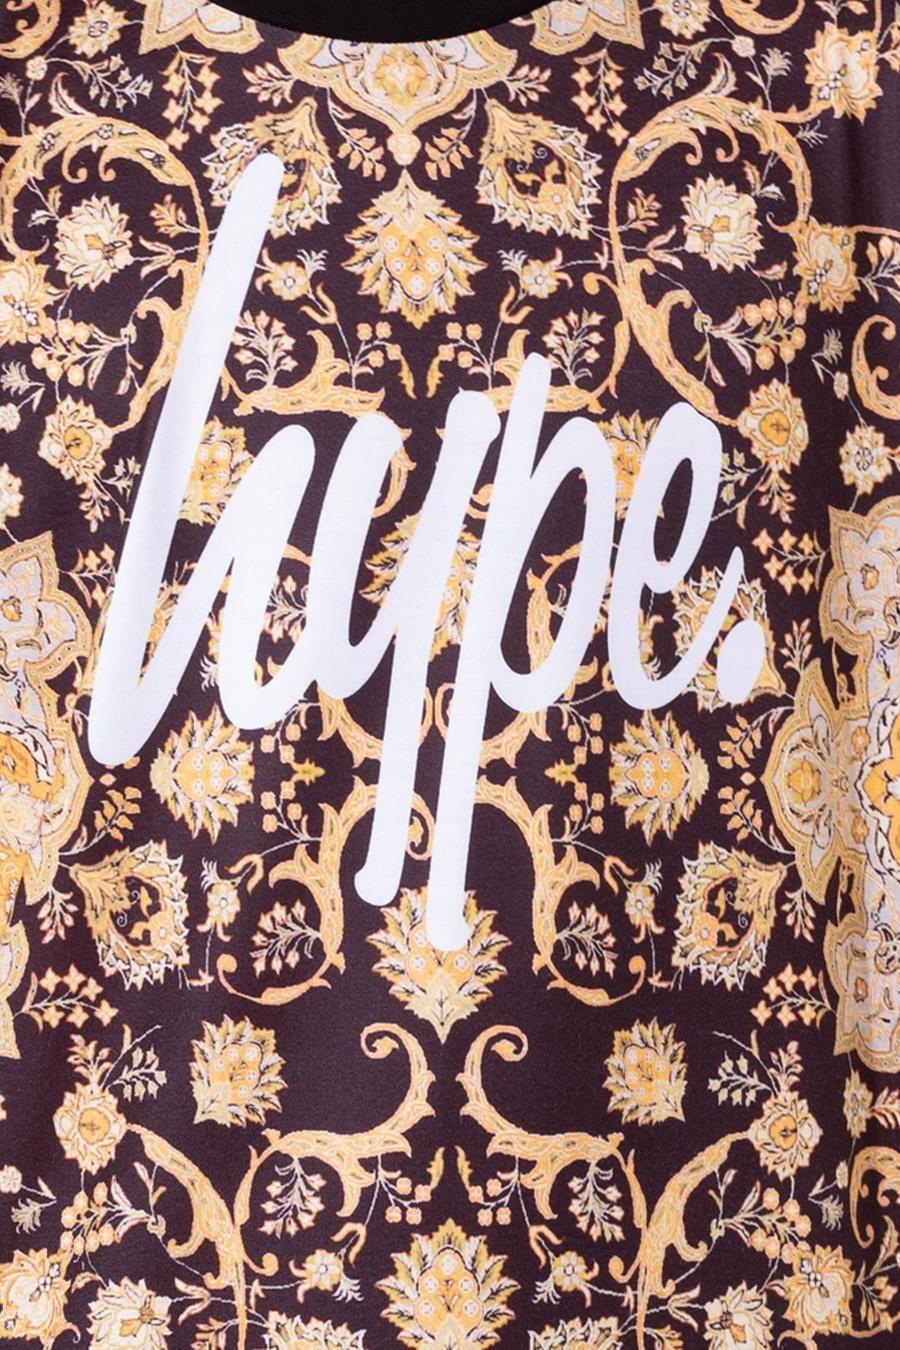 Hype Sace Kids T-Shirt 11-12Y